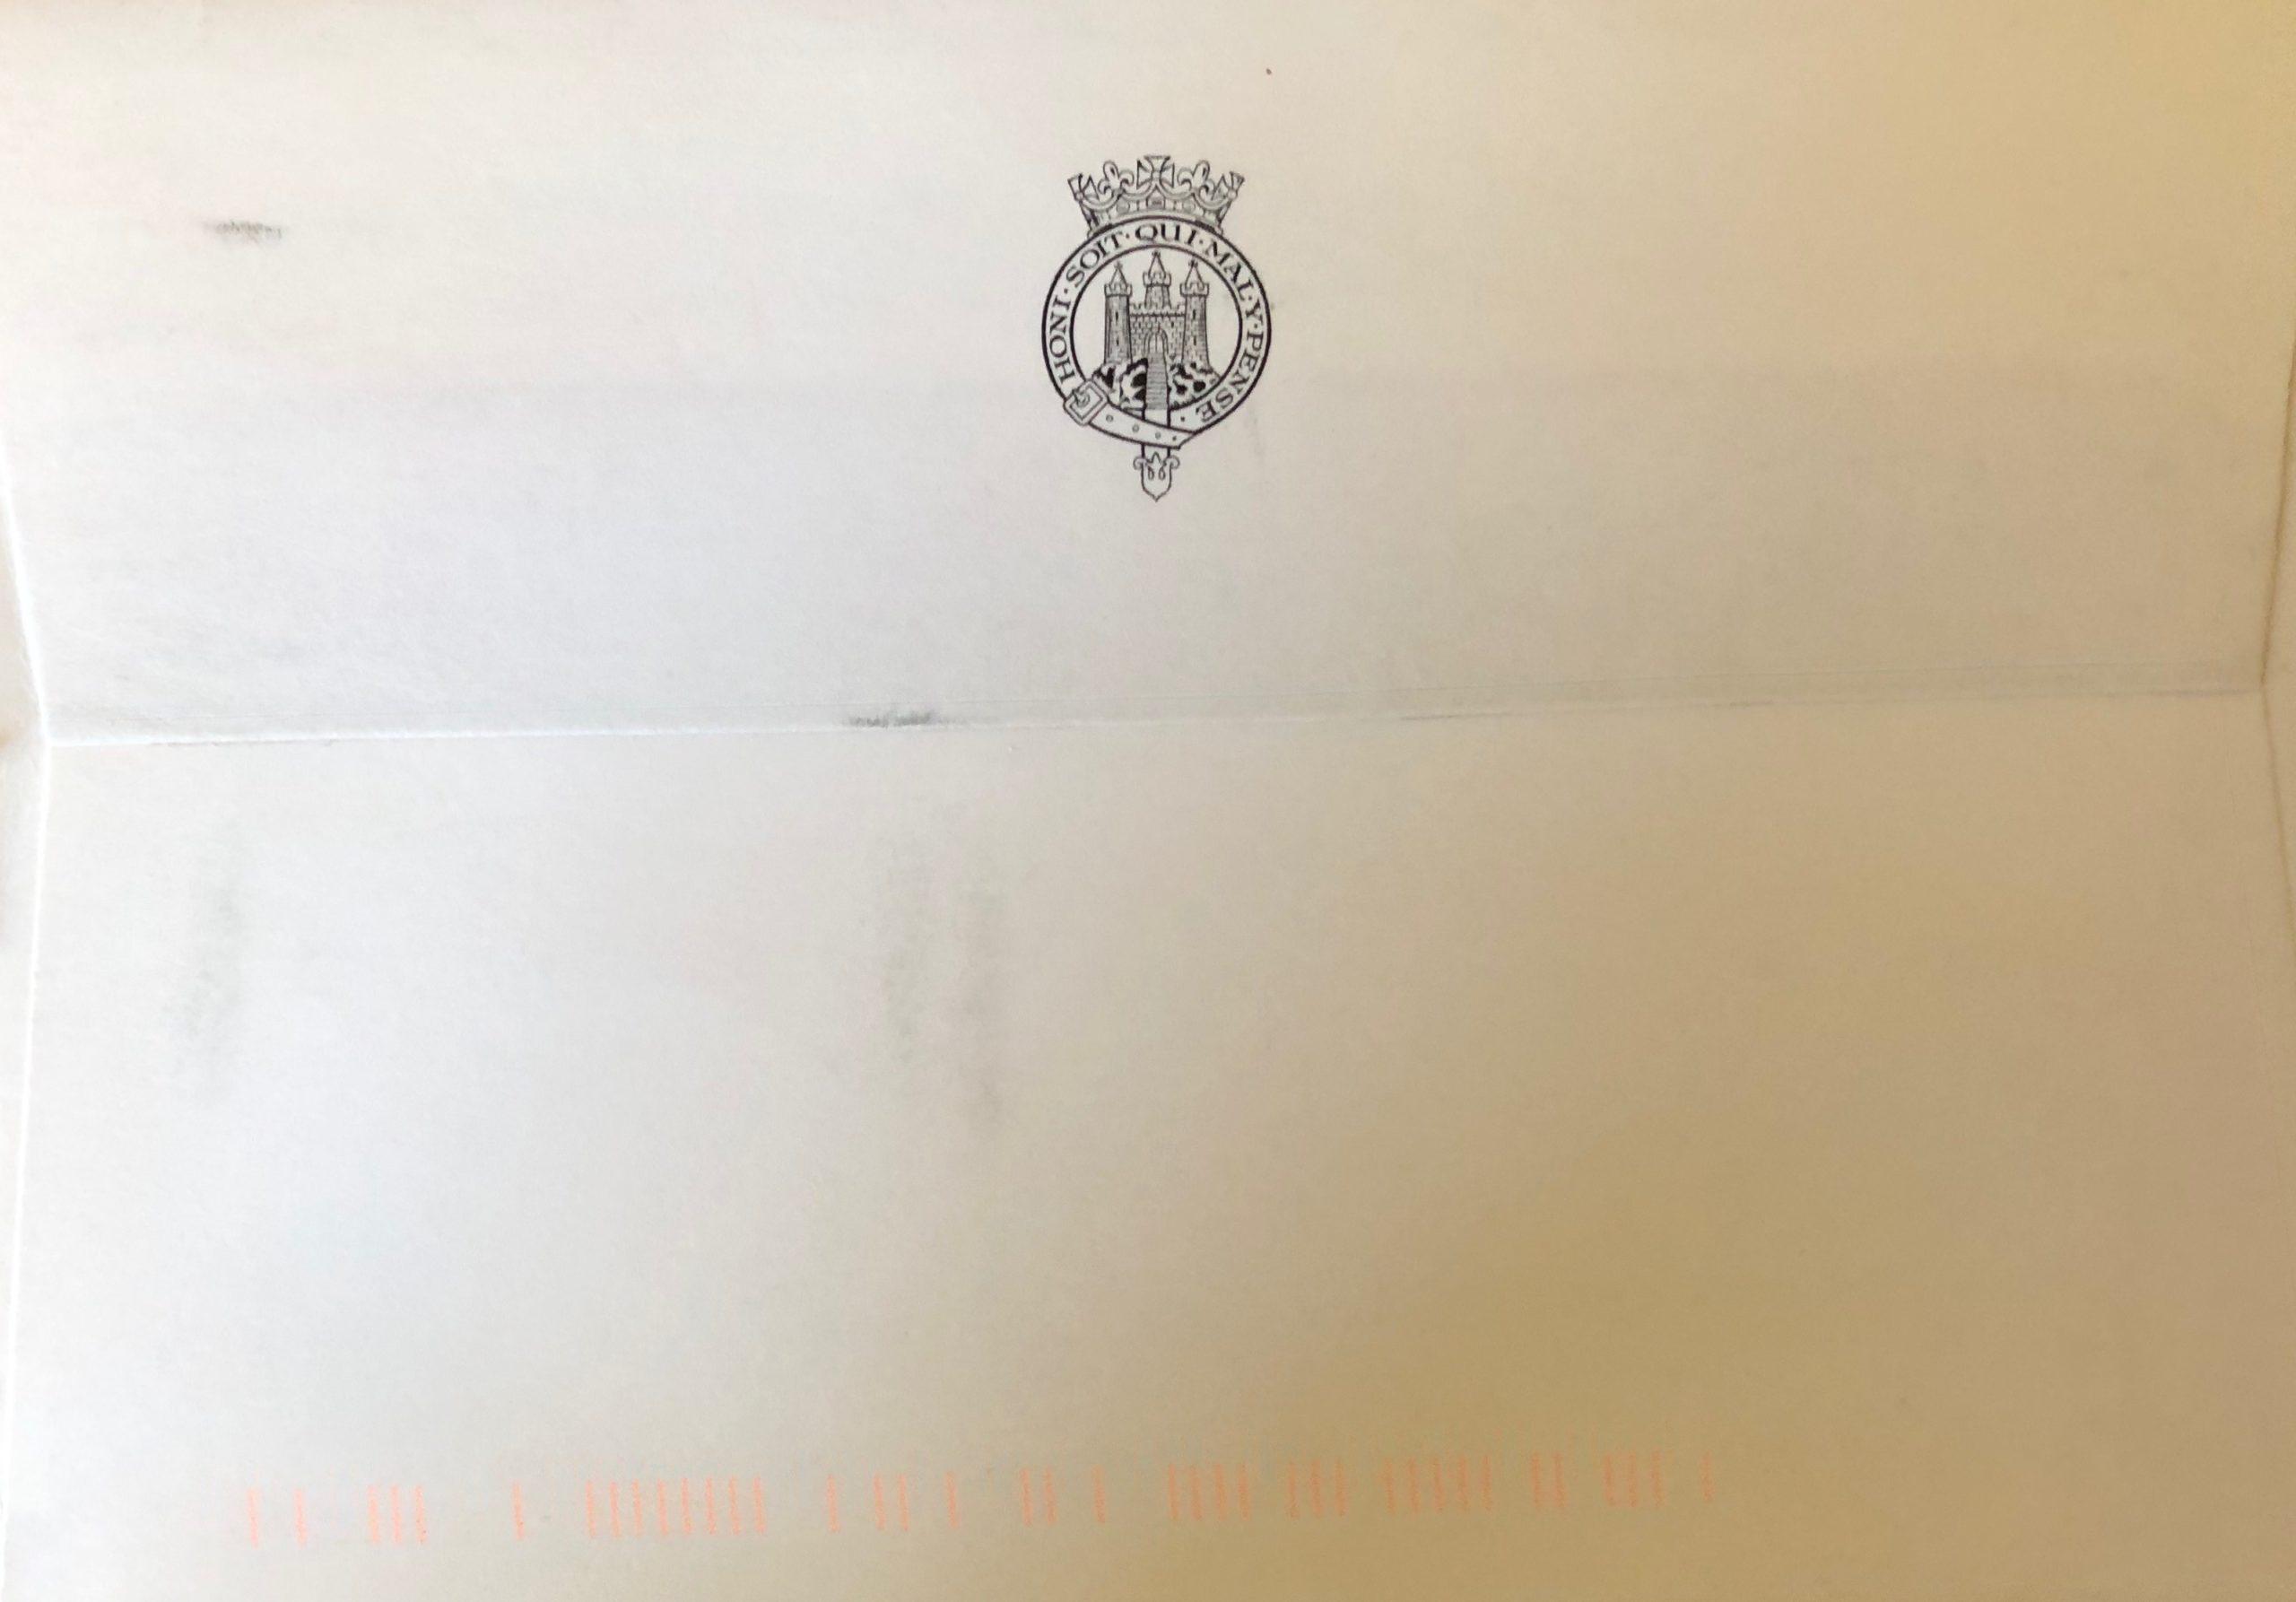 Prince Philip's 99th Birthday Reply